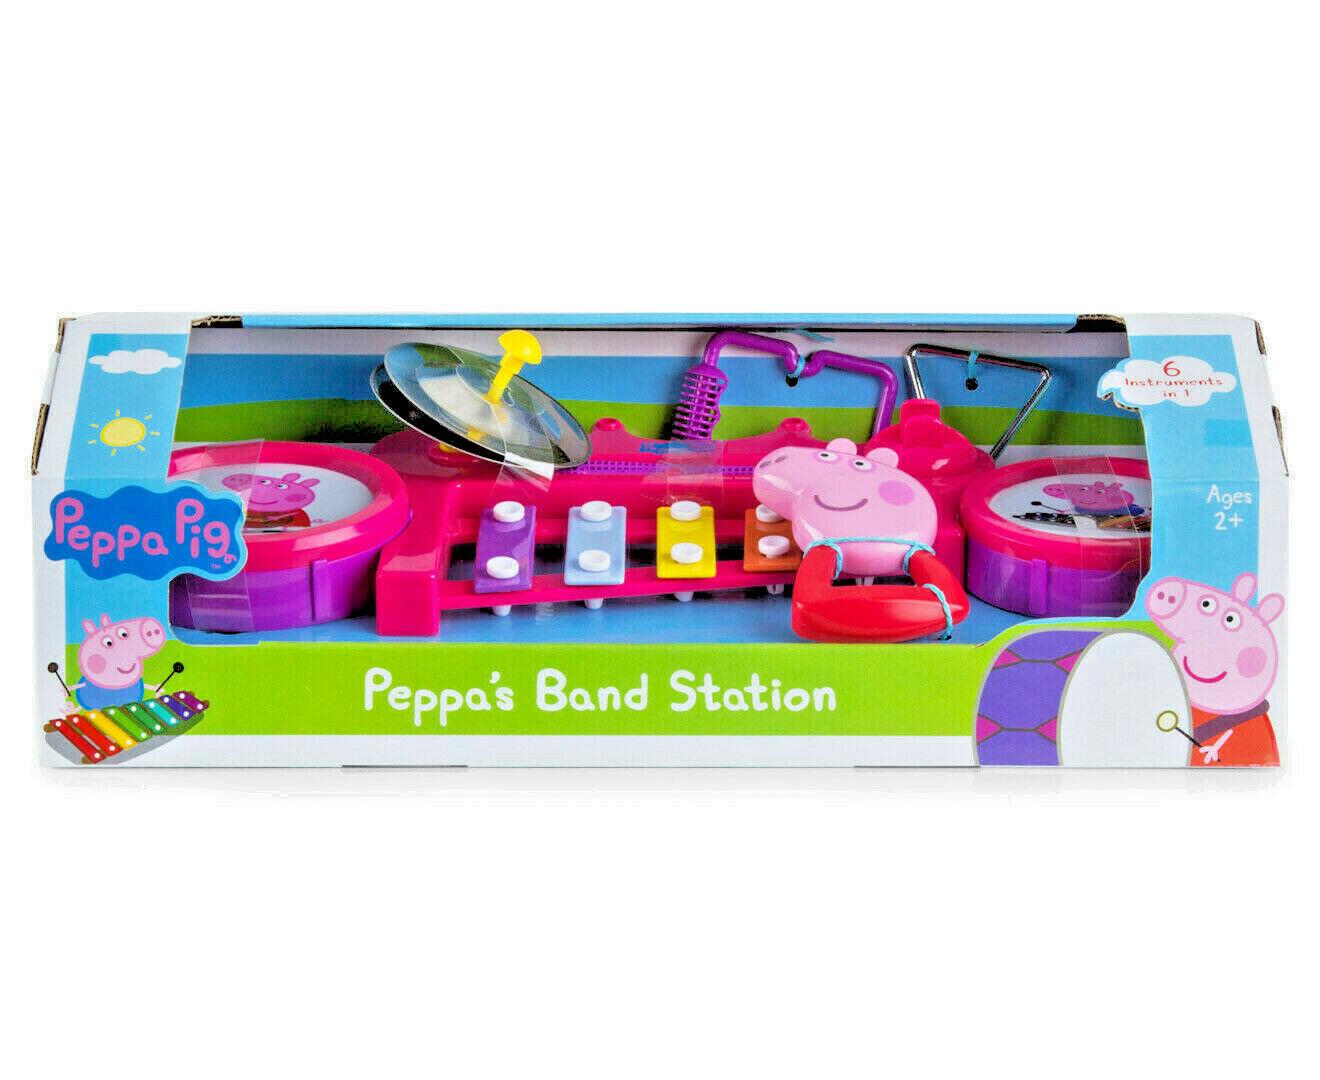 Peppa Pig Kitchen neuf rare jouet